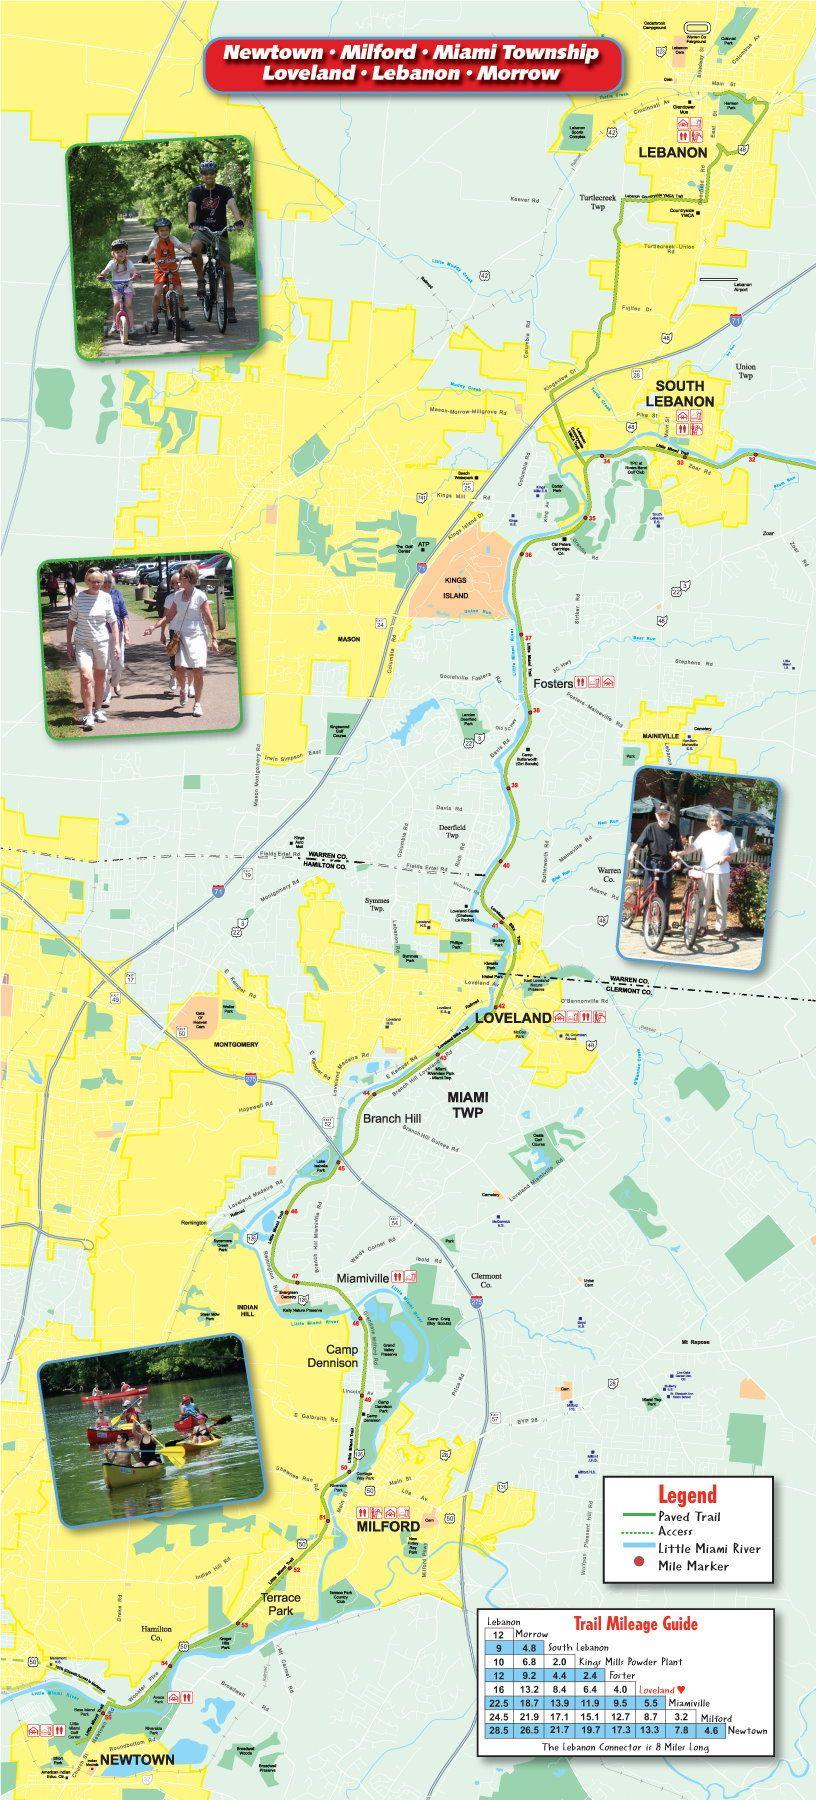 Bike Trails In Ohio Map.Trail Maps Loveland Bike Trail Map Loveland Ohio Bed And